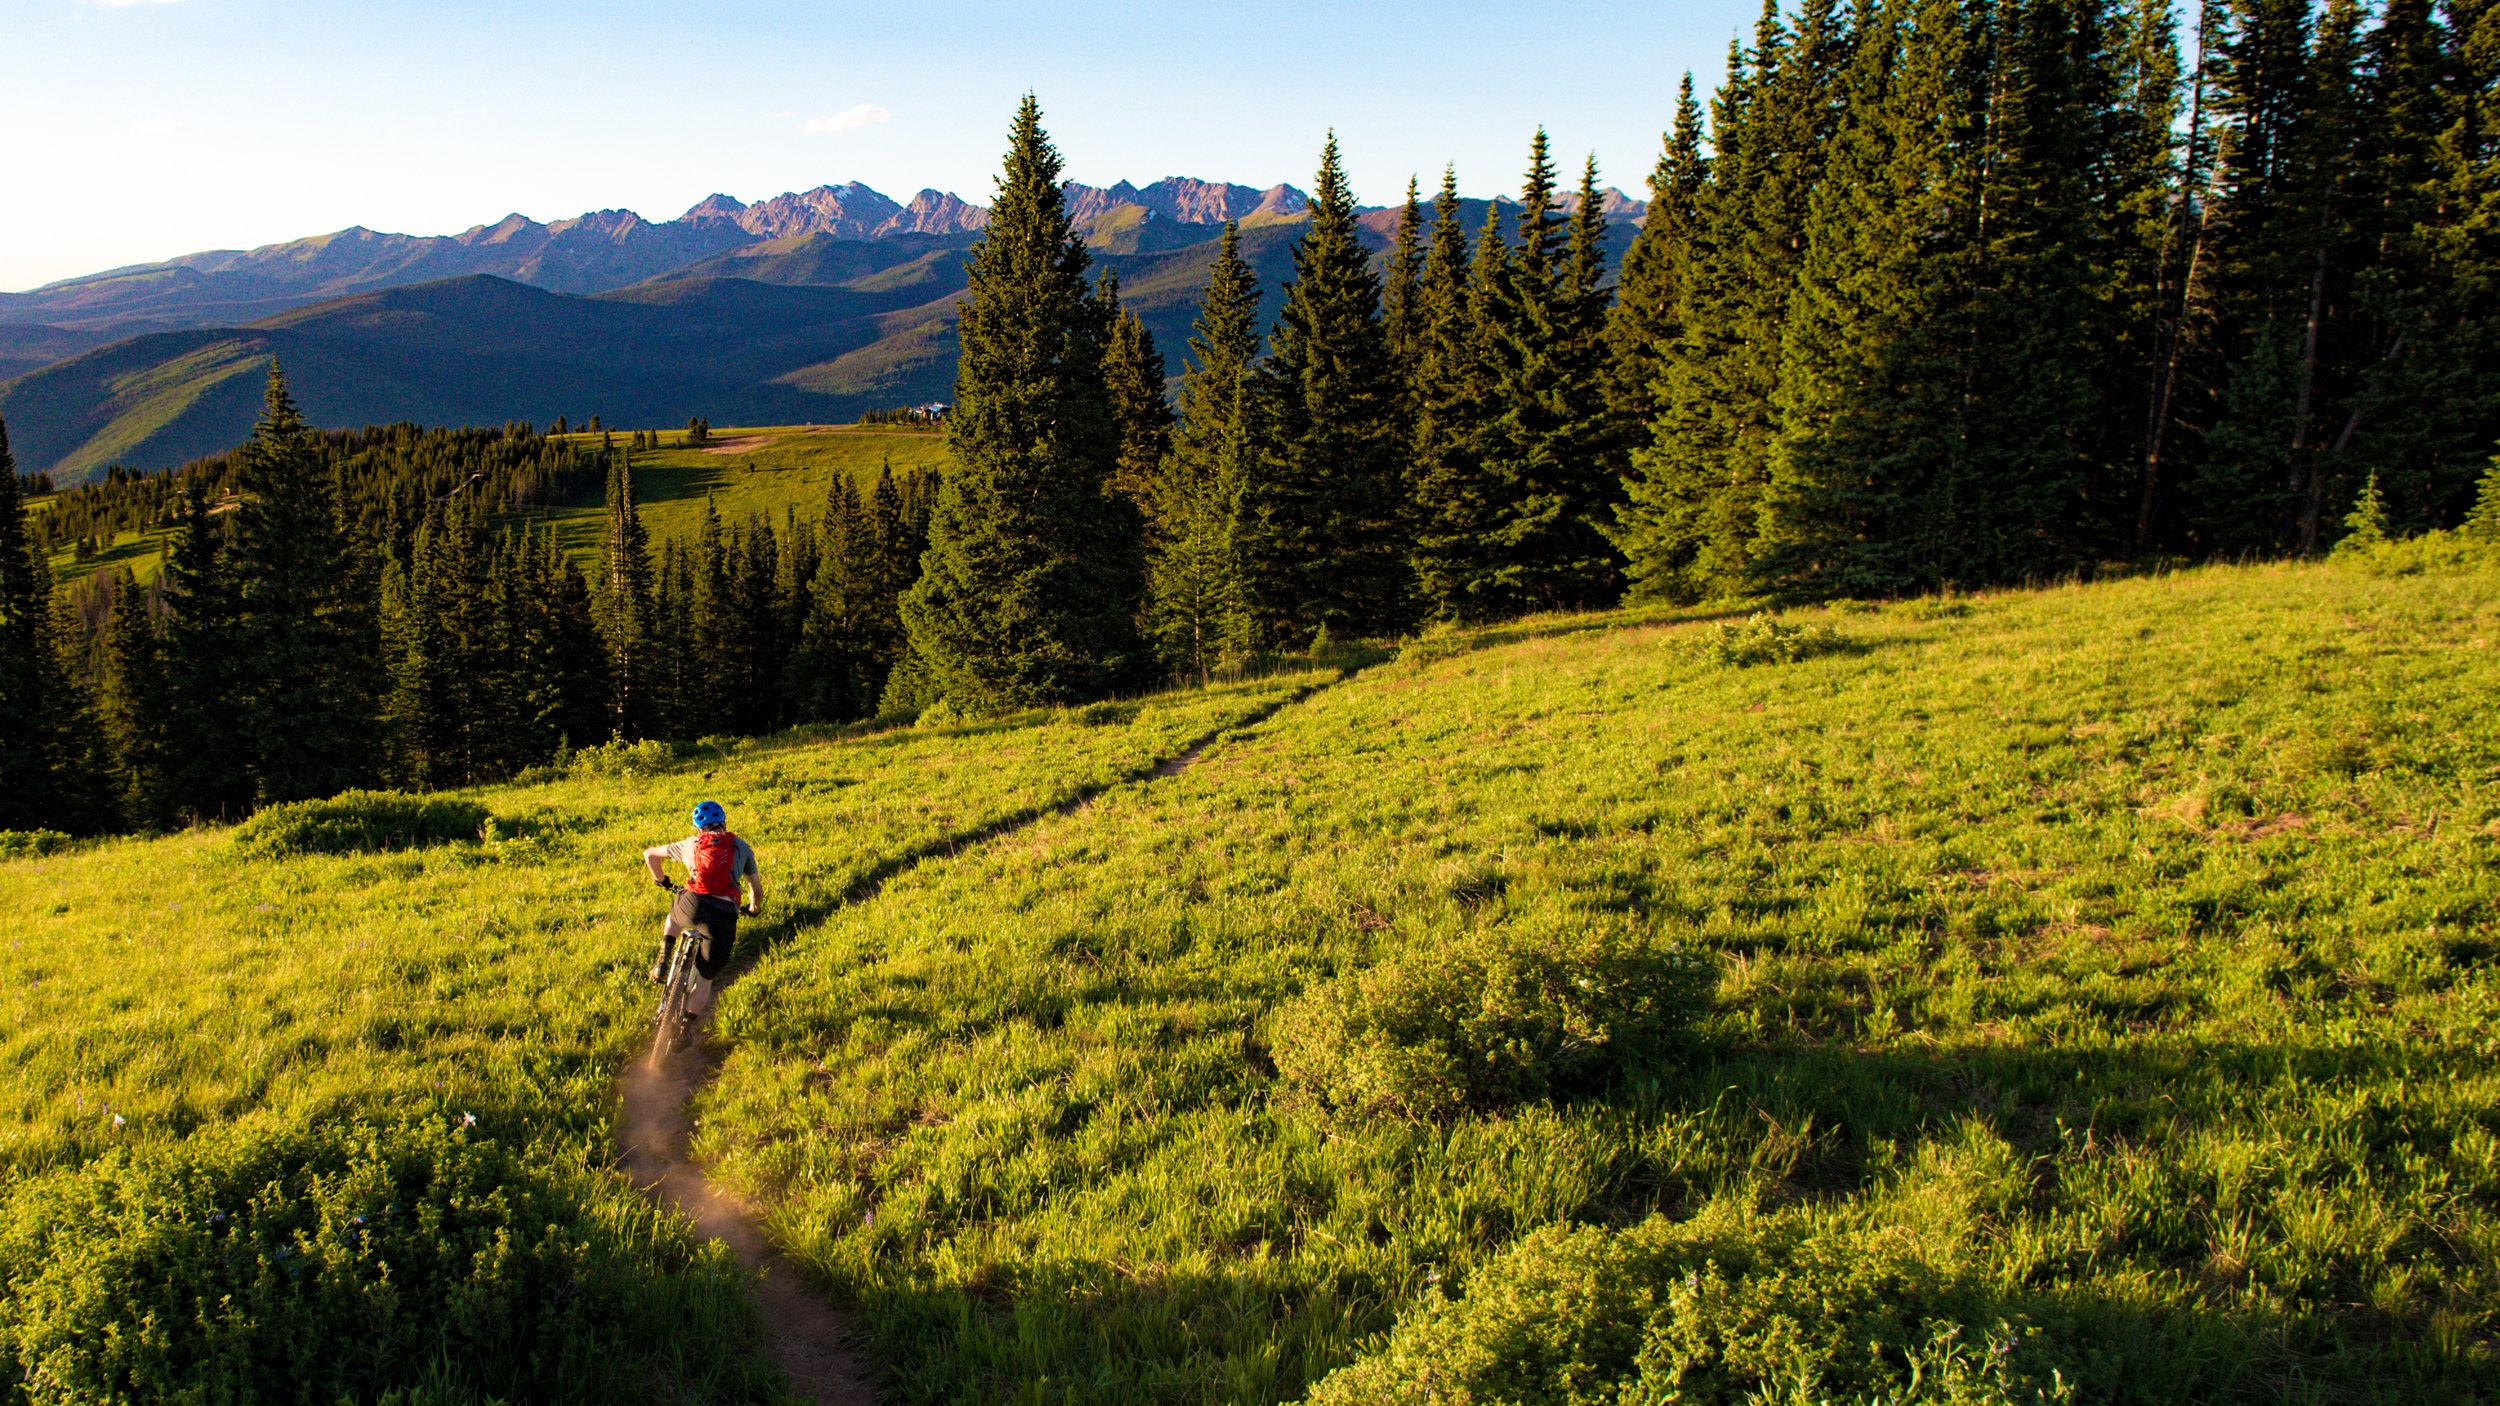 Vail_Mountain_Biking_P_Jack_Affleck0006.jpg